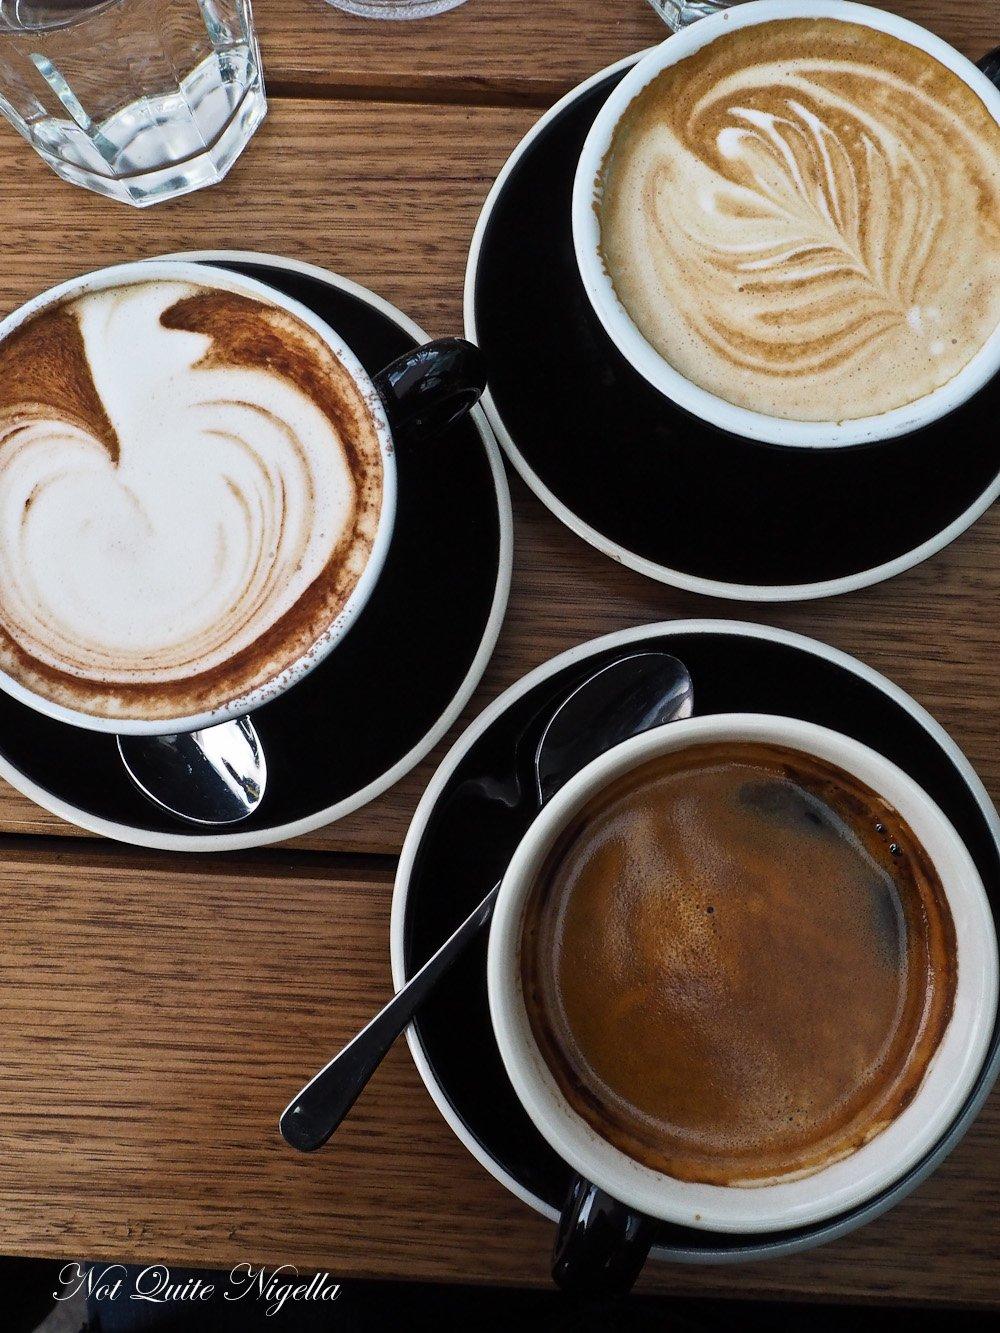 Paesanella Cafe